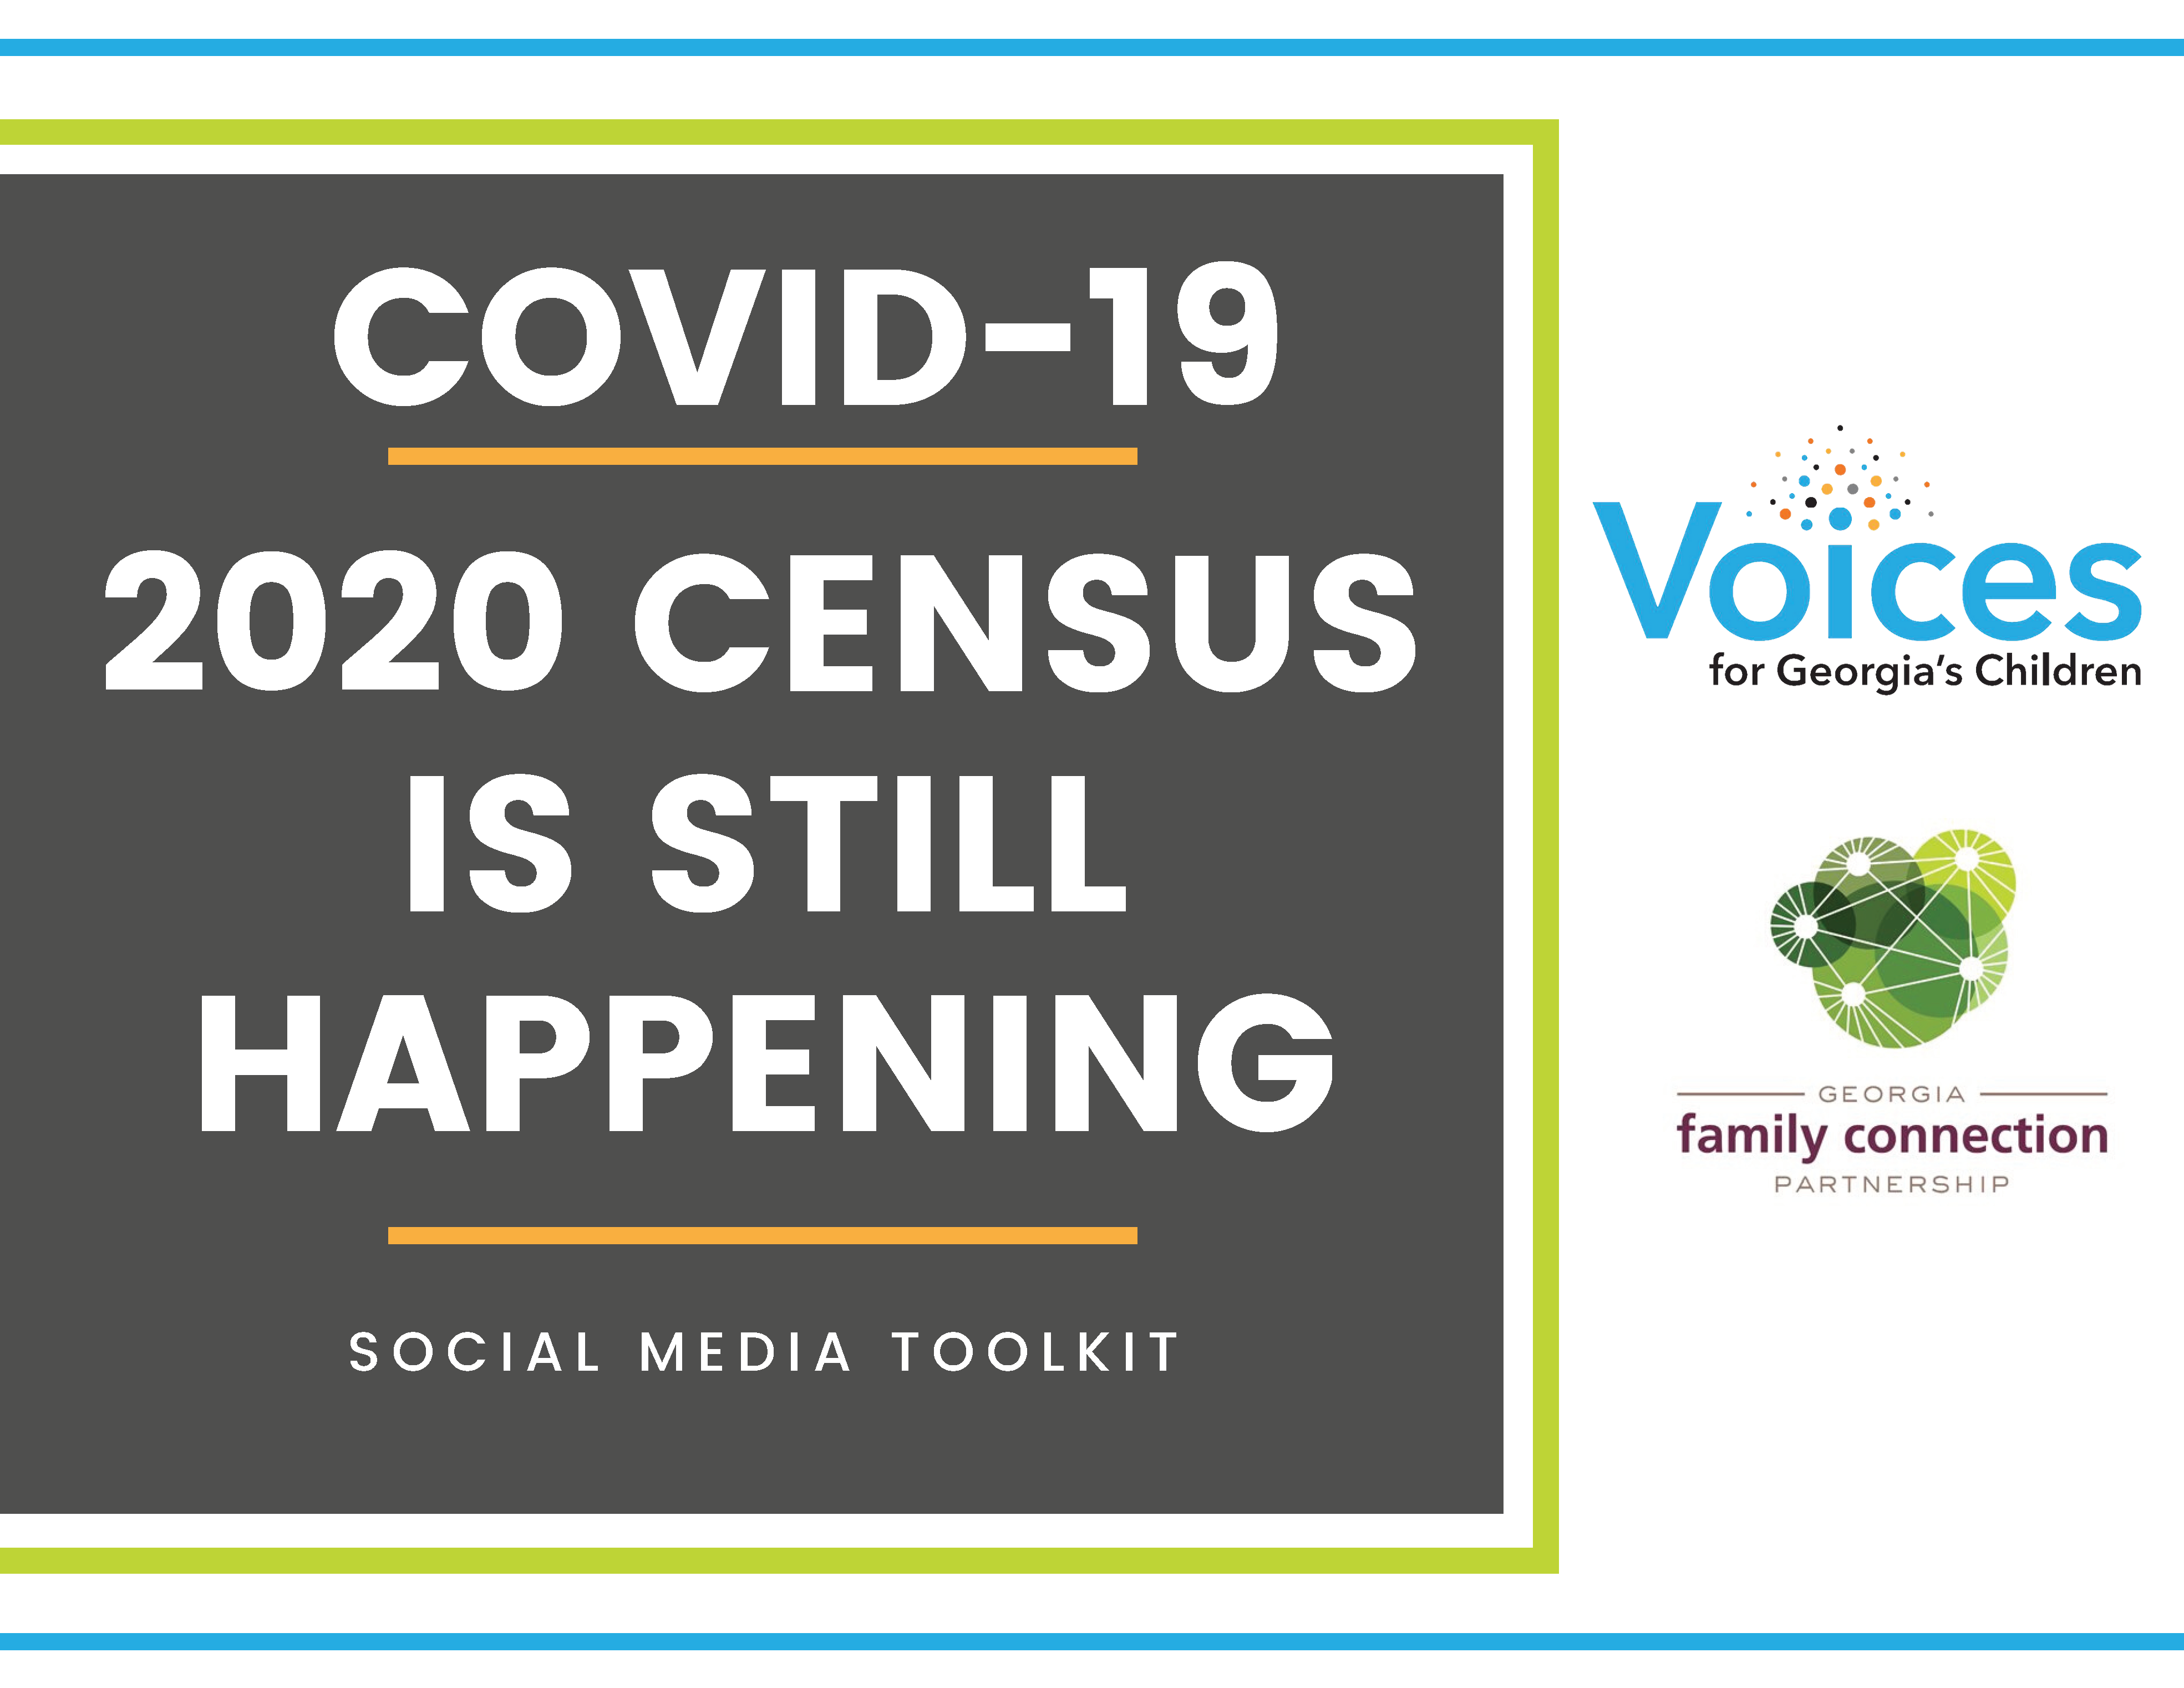 COVID-19 Social Media KitCOVID-19 Census SM Posts (2)COVID-19 Census SM Posts (4)COVID-19 Census SM